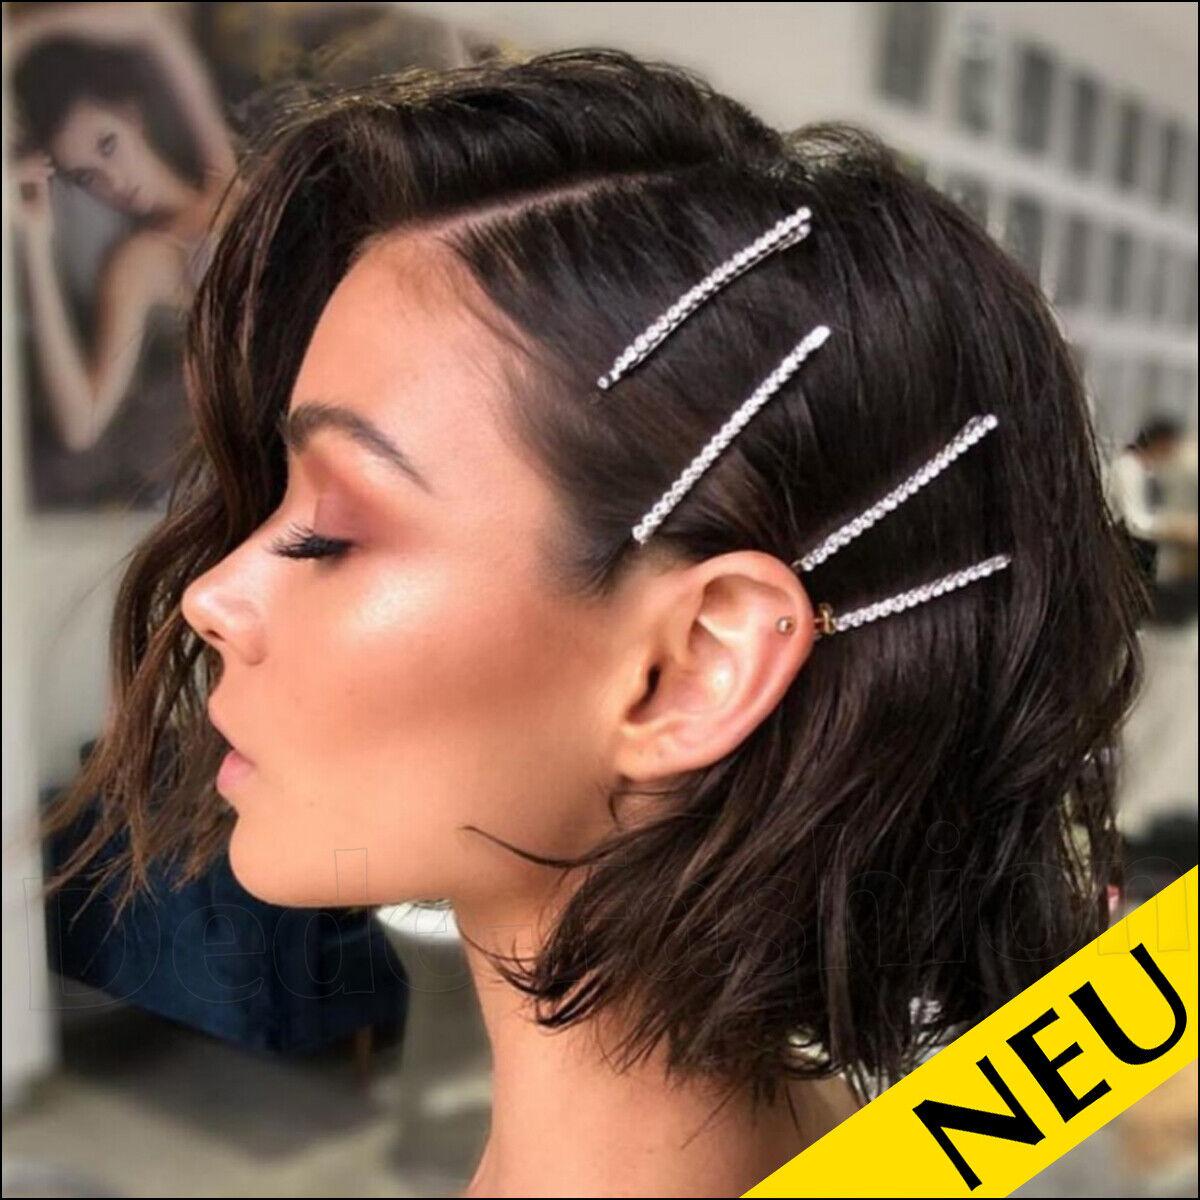 NEU 🌸 Glitzer HAARKLAMMER Kristall STRASS Silber PARTY Modeschmuck 🌸 Fashion